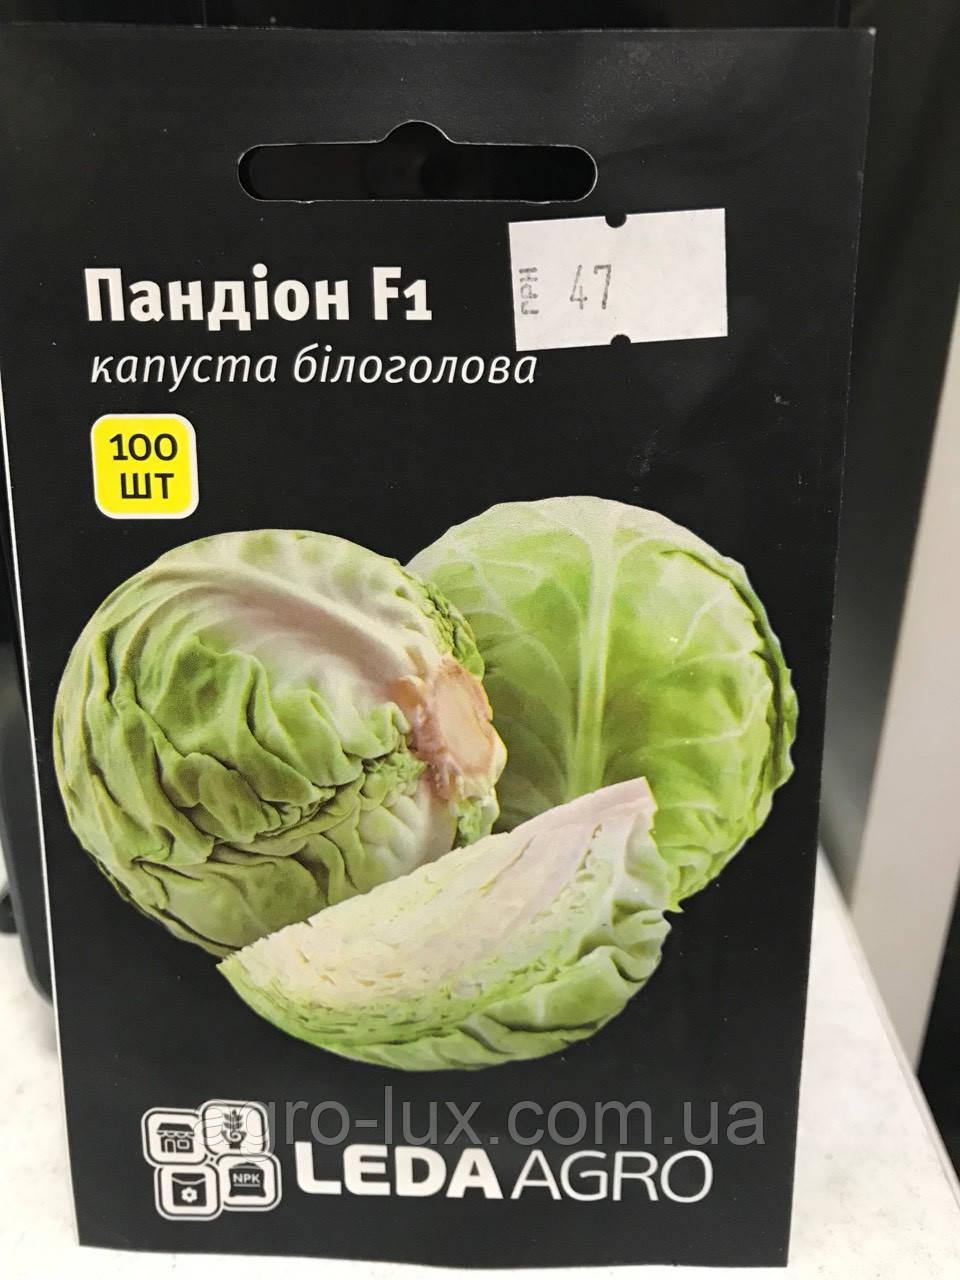 Семена капусты ранней Пандион F1 100 шт